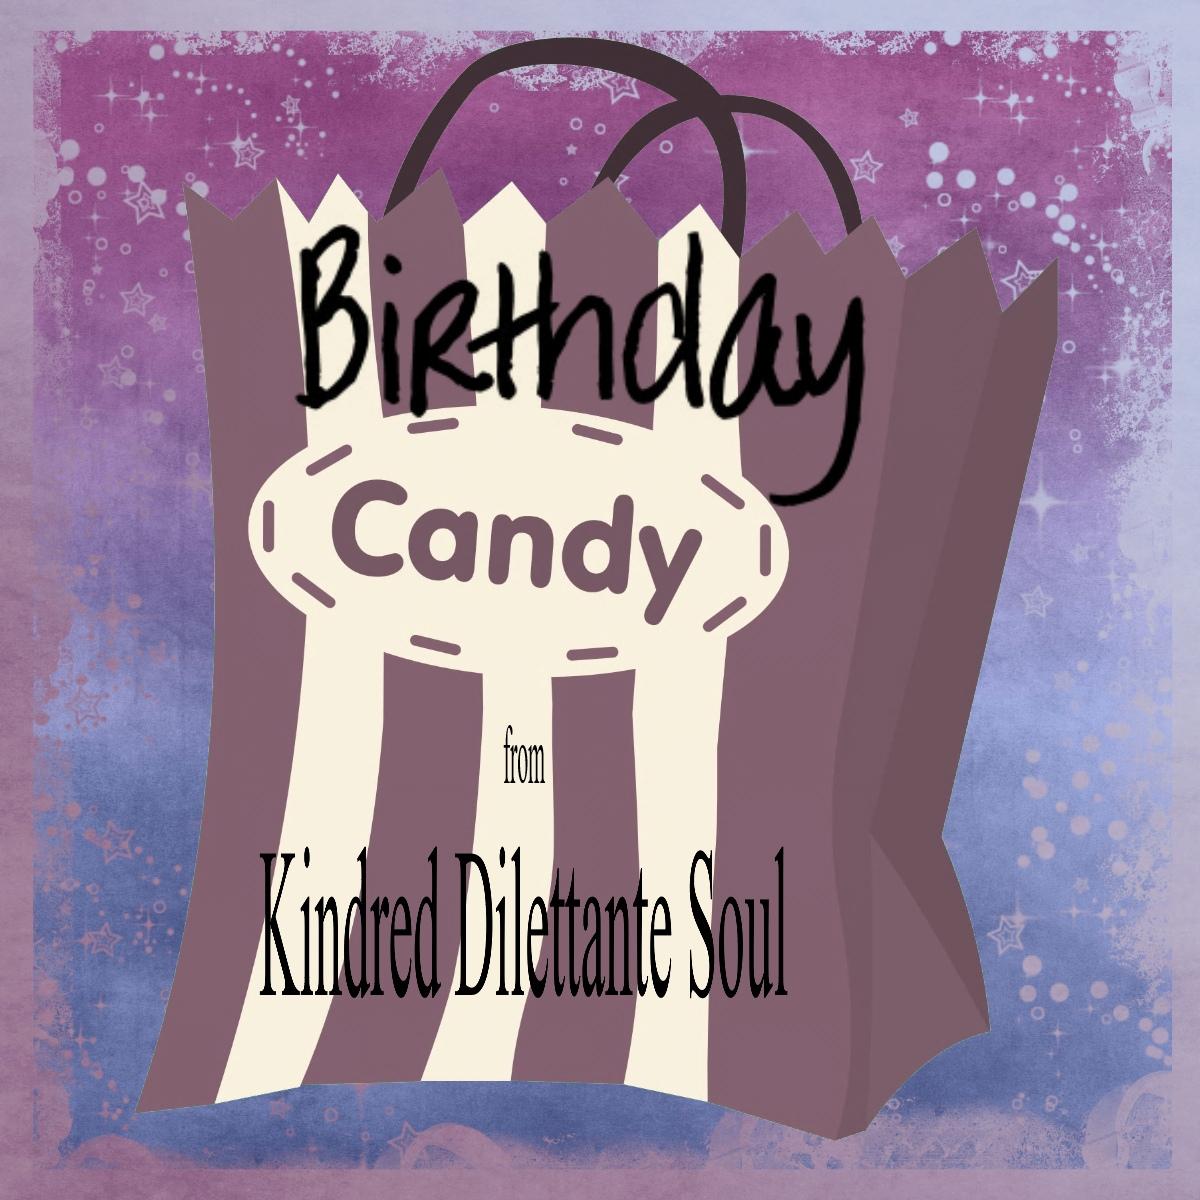 Tracy's Birthday Candy